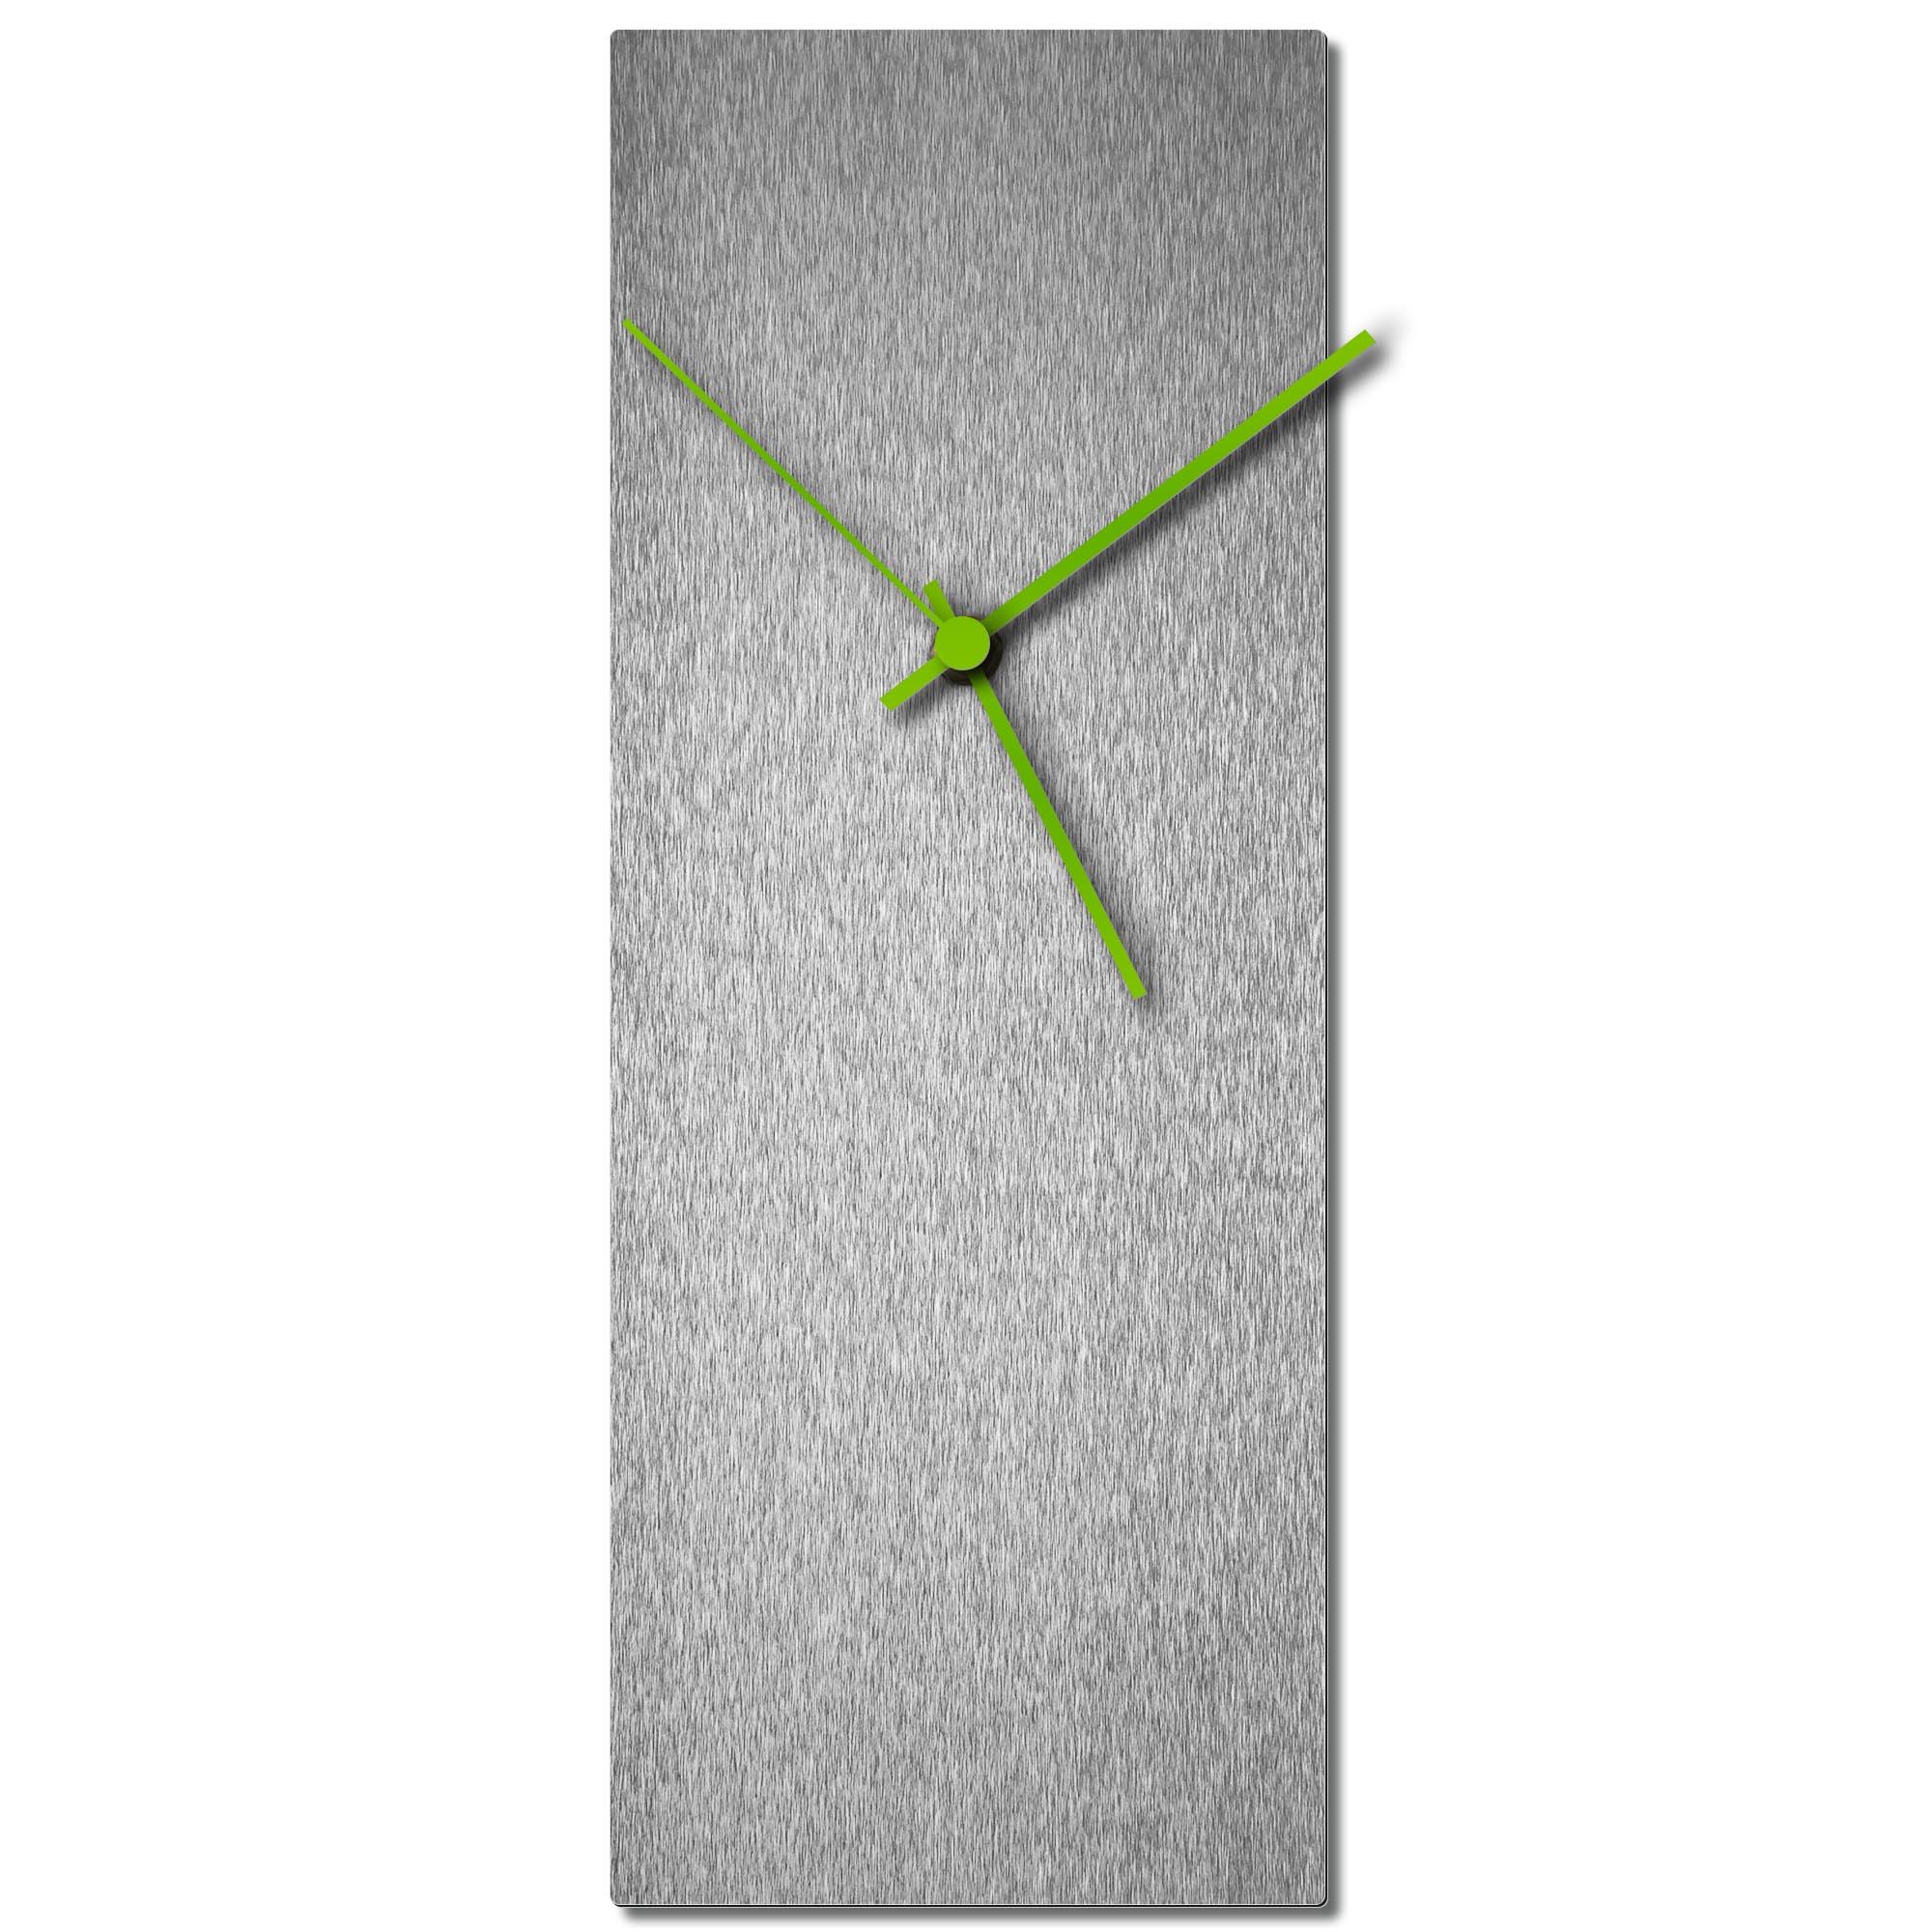 Adam Schwoeppe 'Silversmith Clock Large Green' Midcentury Modern Style Wall Clock